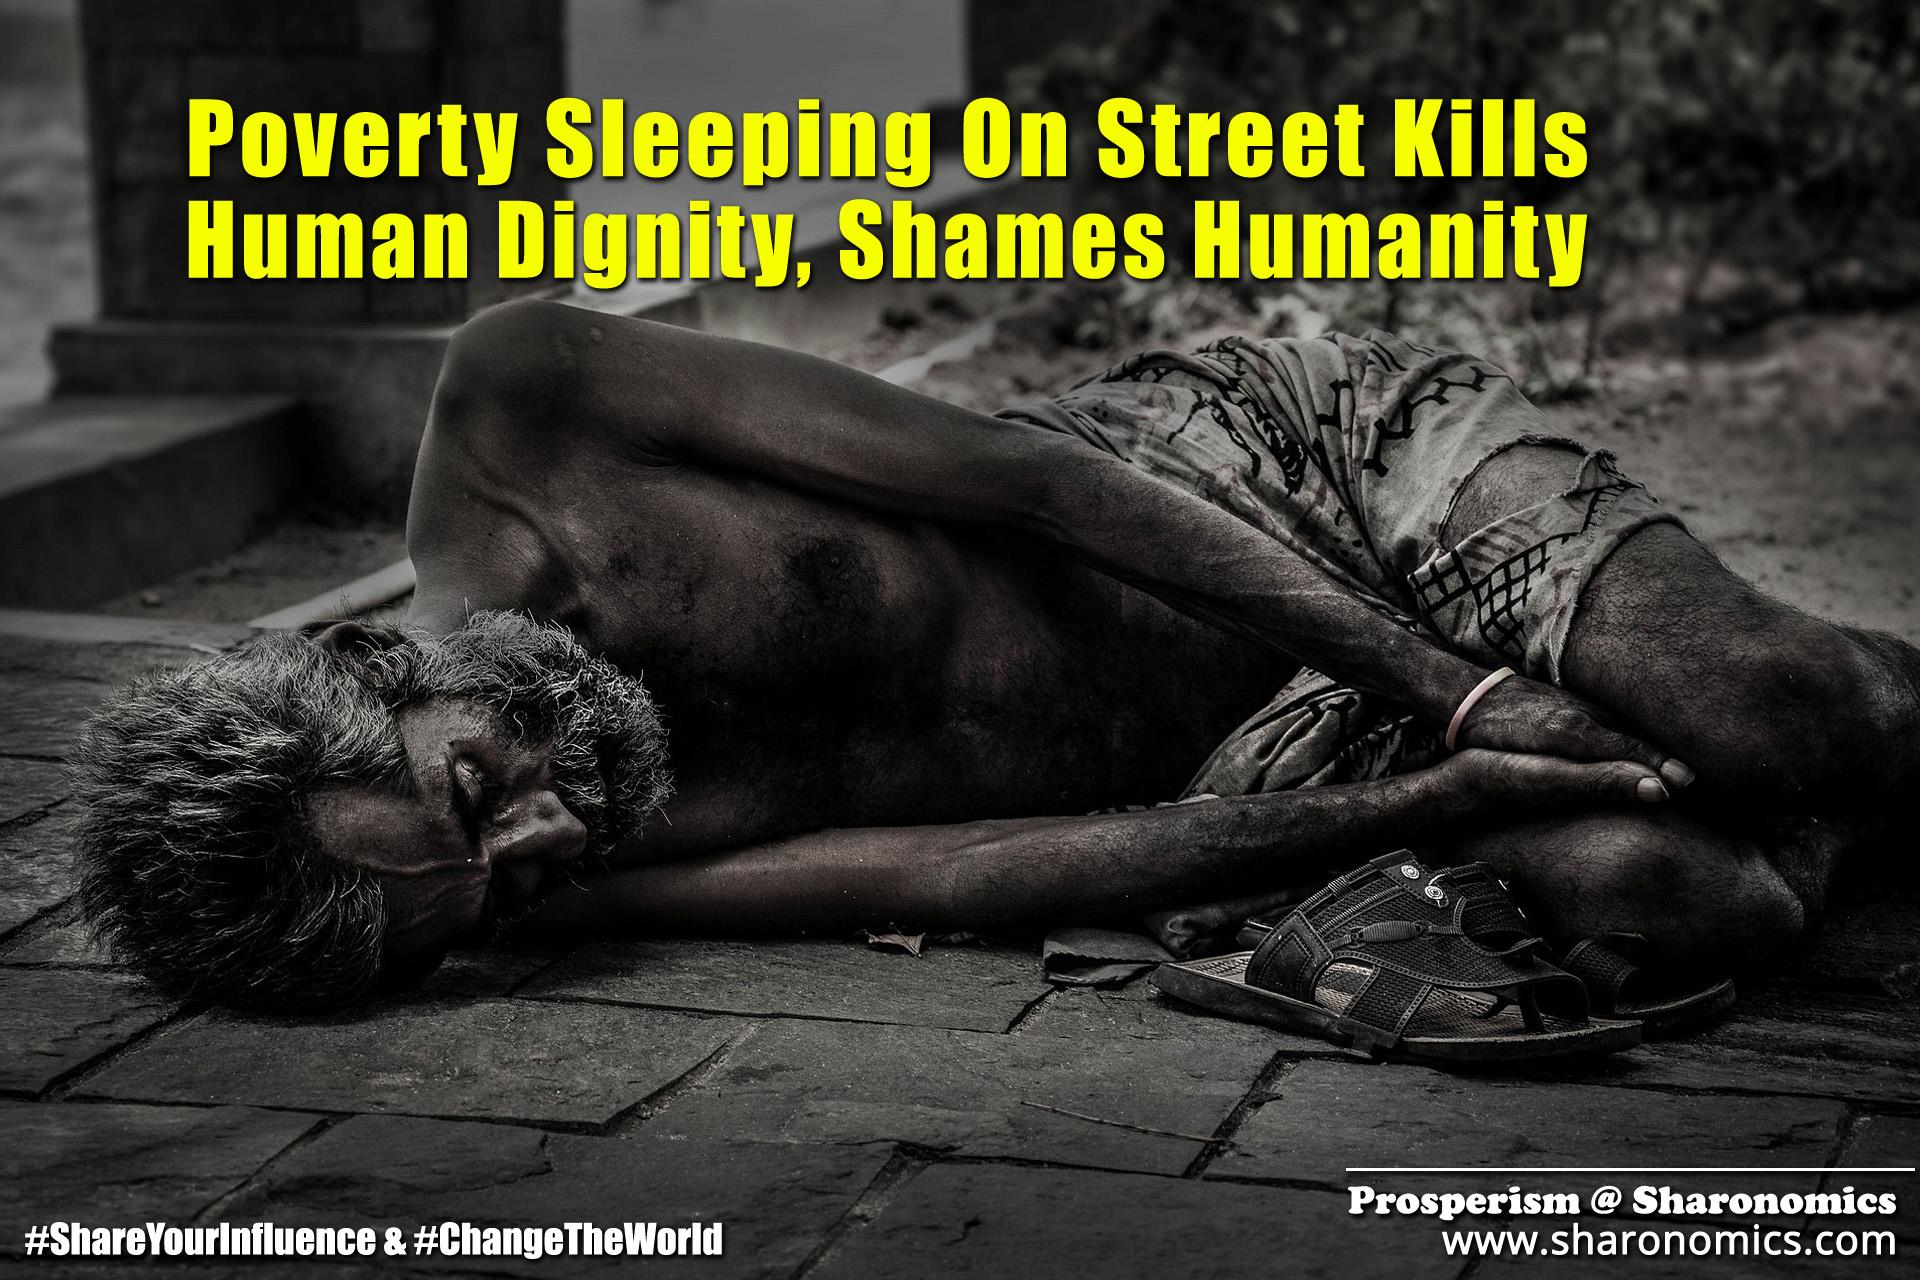 sharonomics, algoshare, prosperism, autonio, poverty, charity, #shareyourinfluence, #changetheworld, poverty, street, humanity, dignity, human